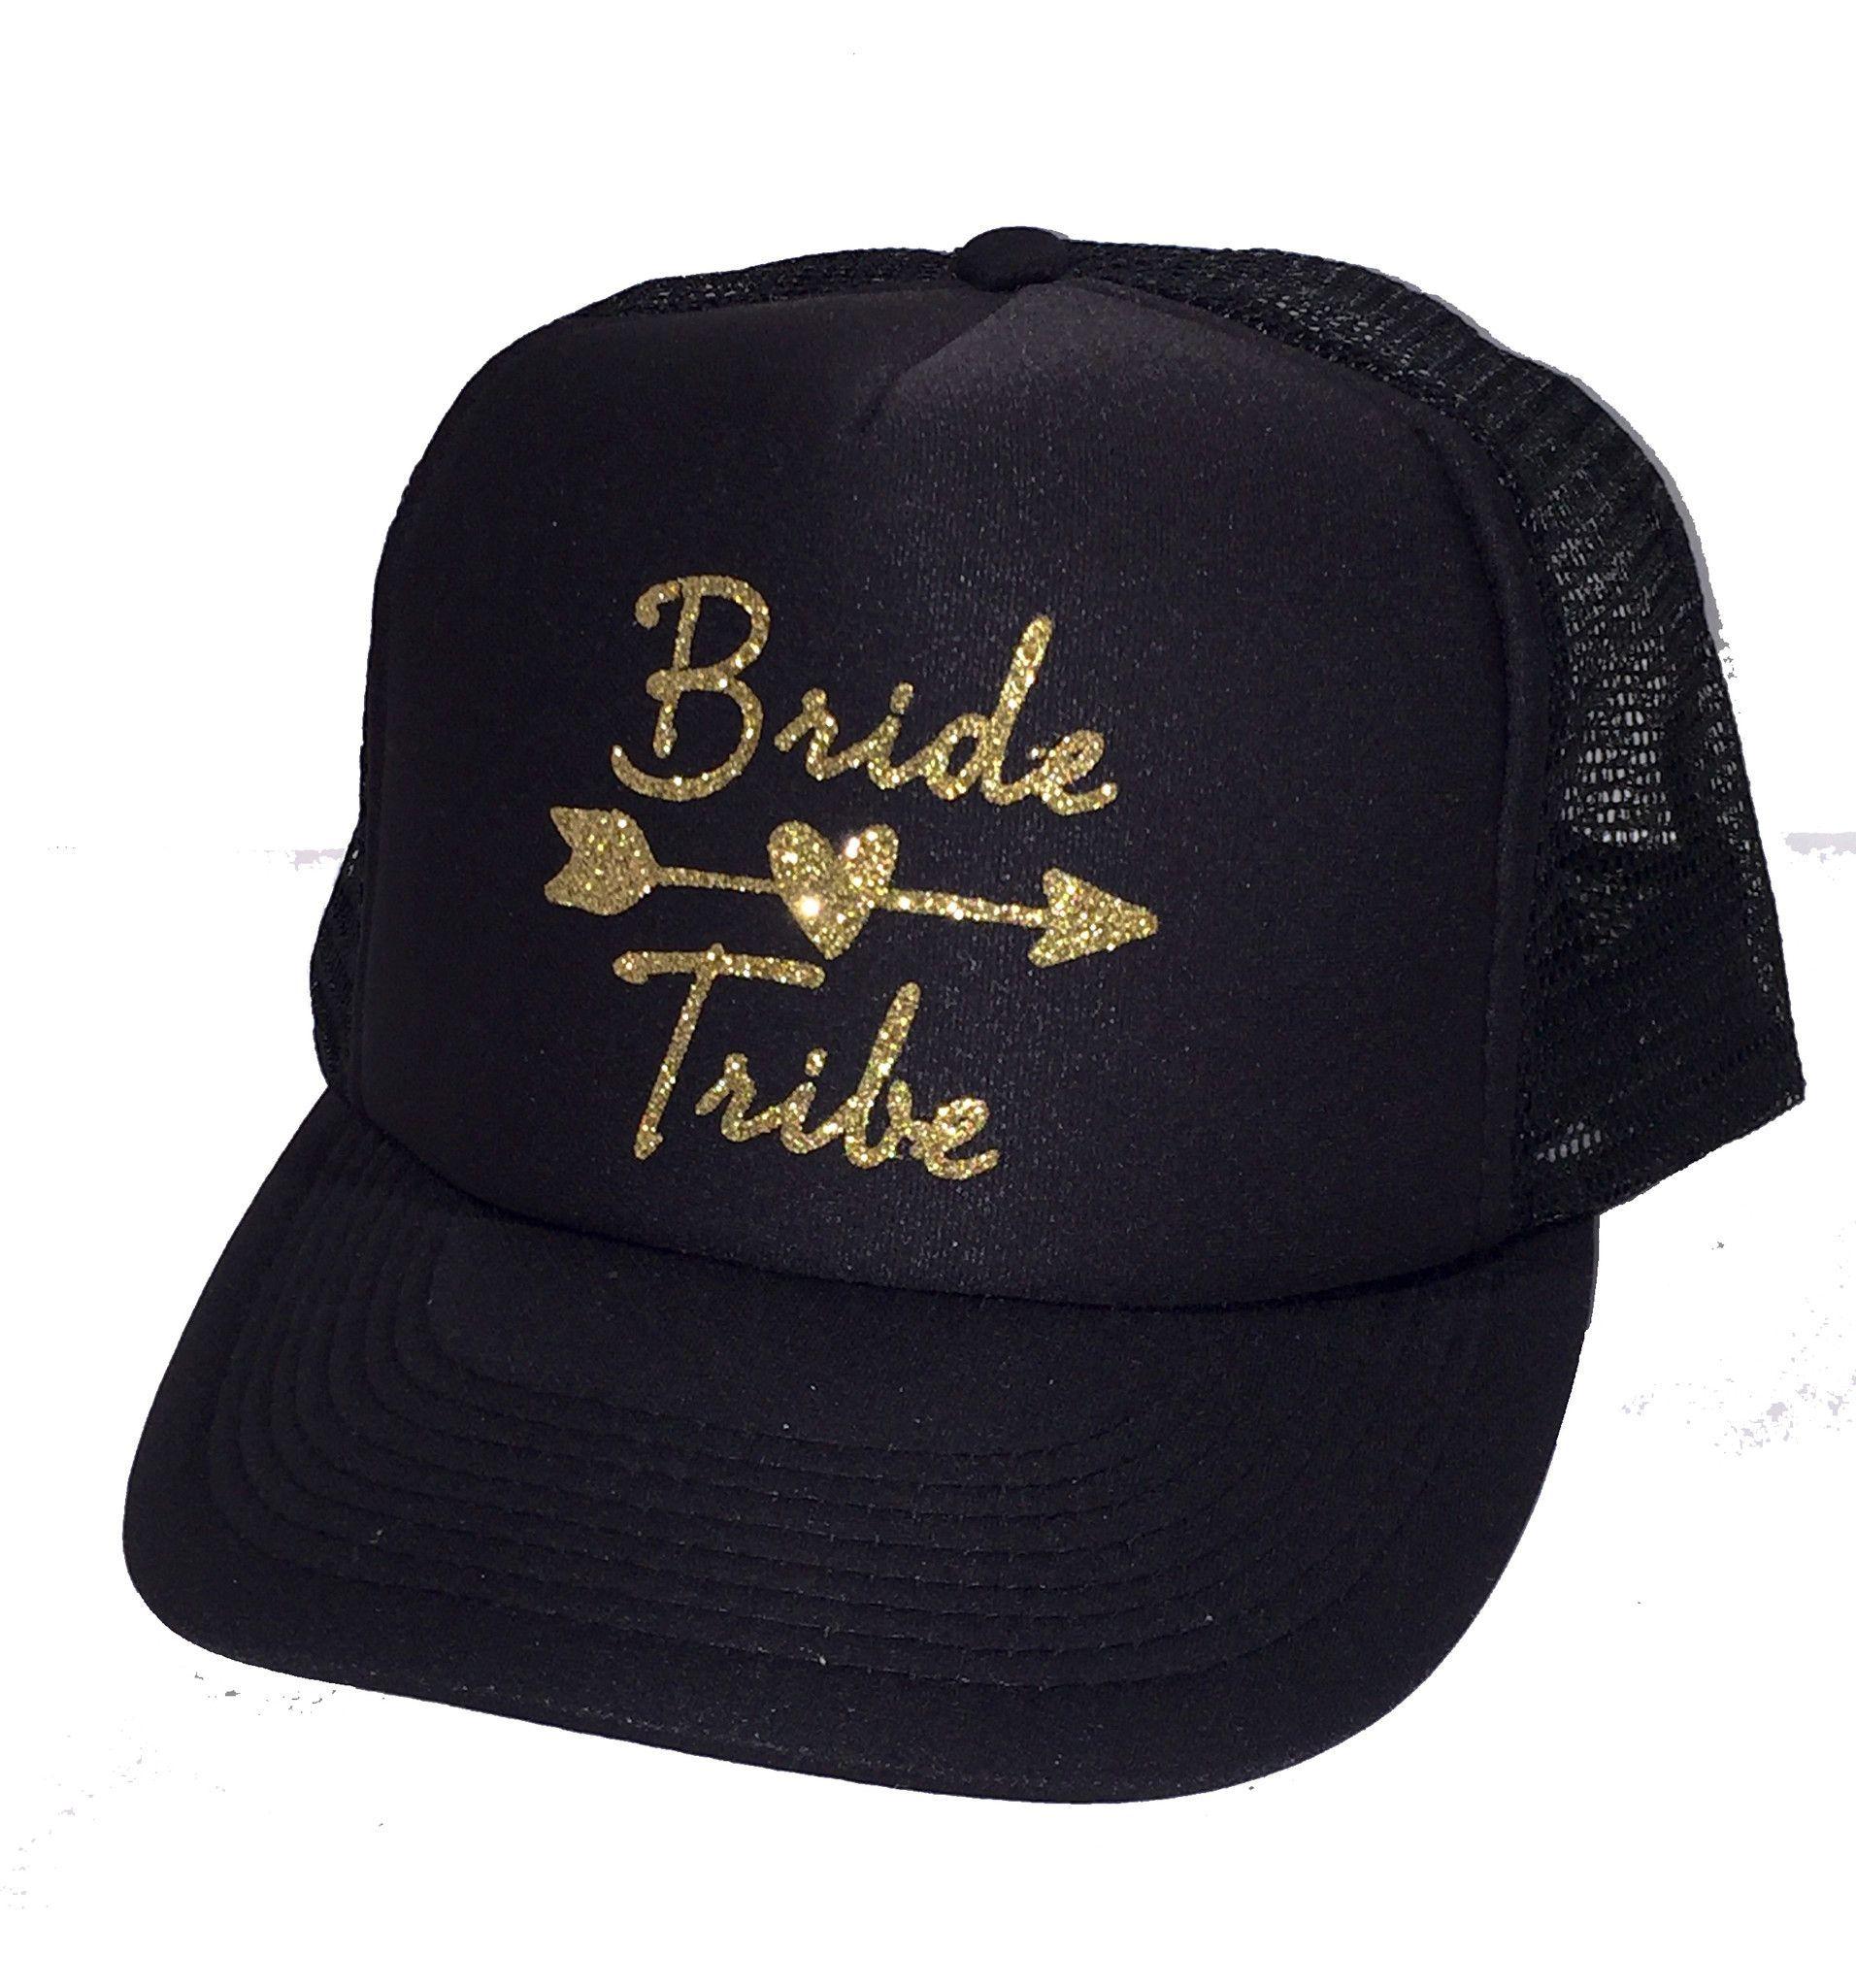 fcc108fa80f5 Bride Tribe Glitter Trucker Hat en 2019 | accesorios arriba | Gorras ...